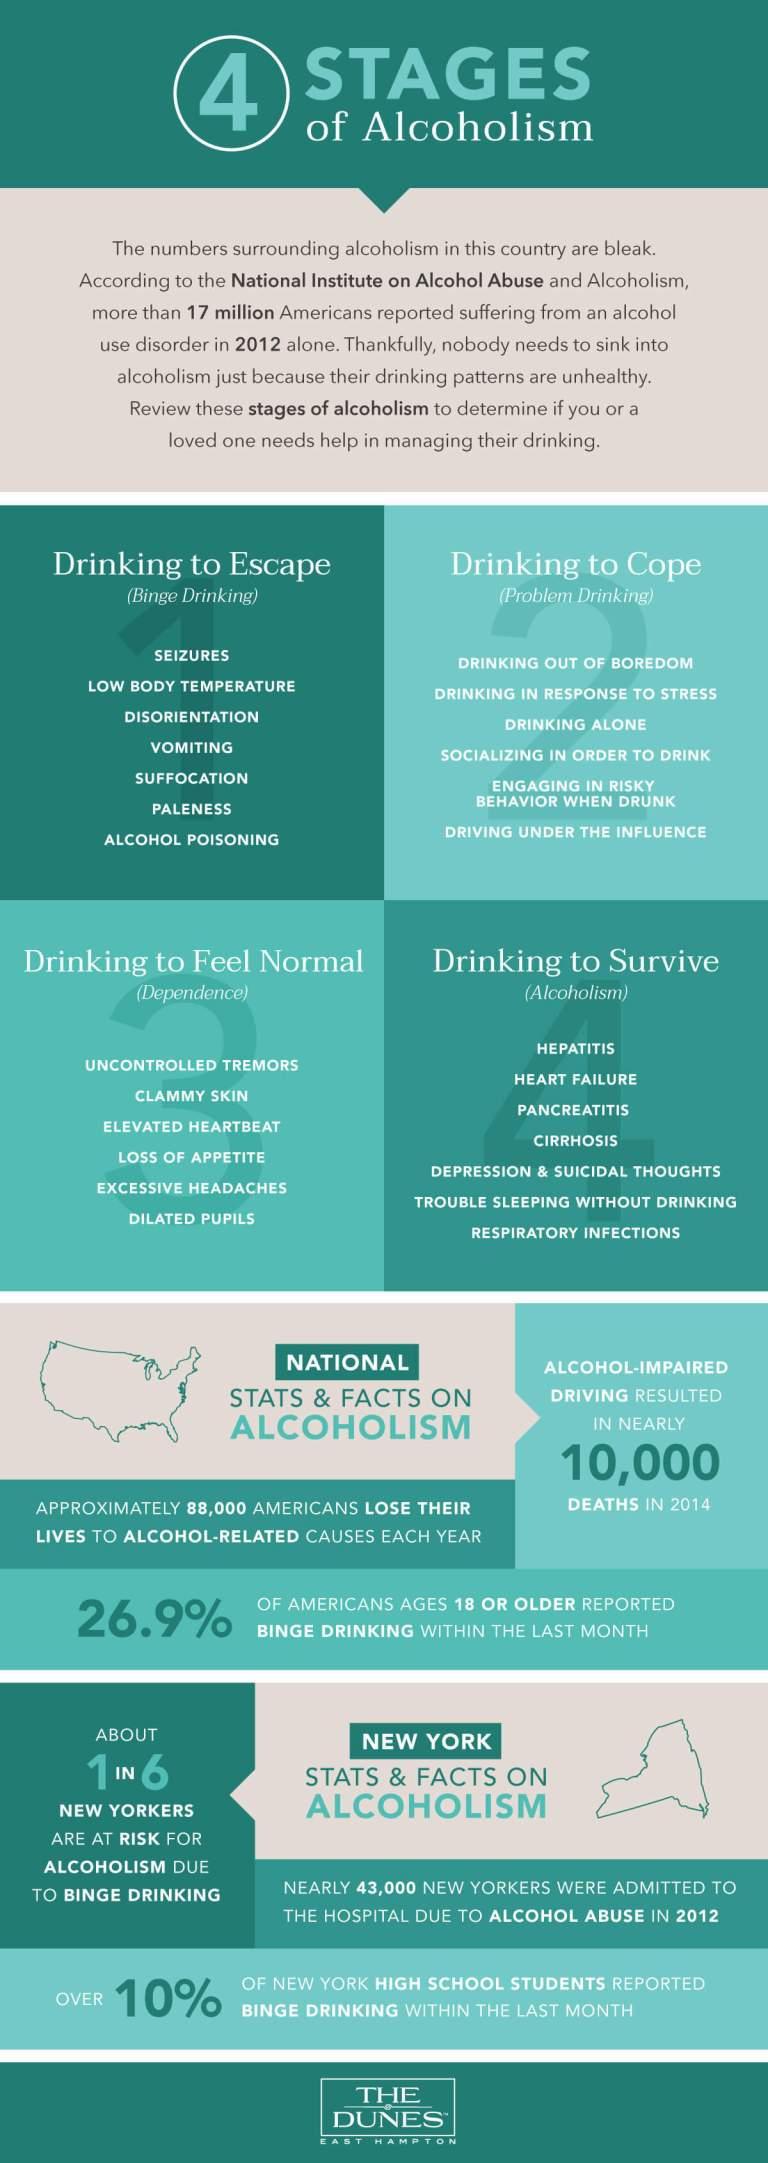 4StagesofAlcoholism